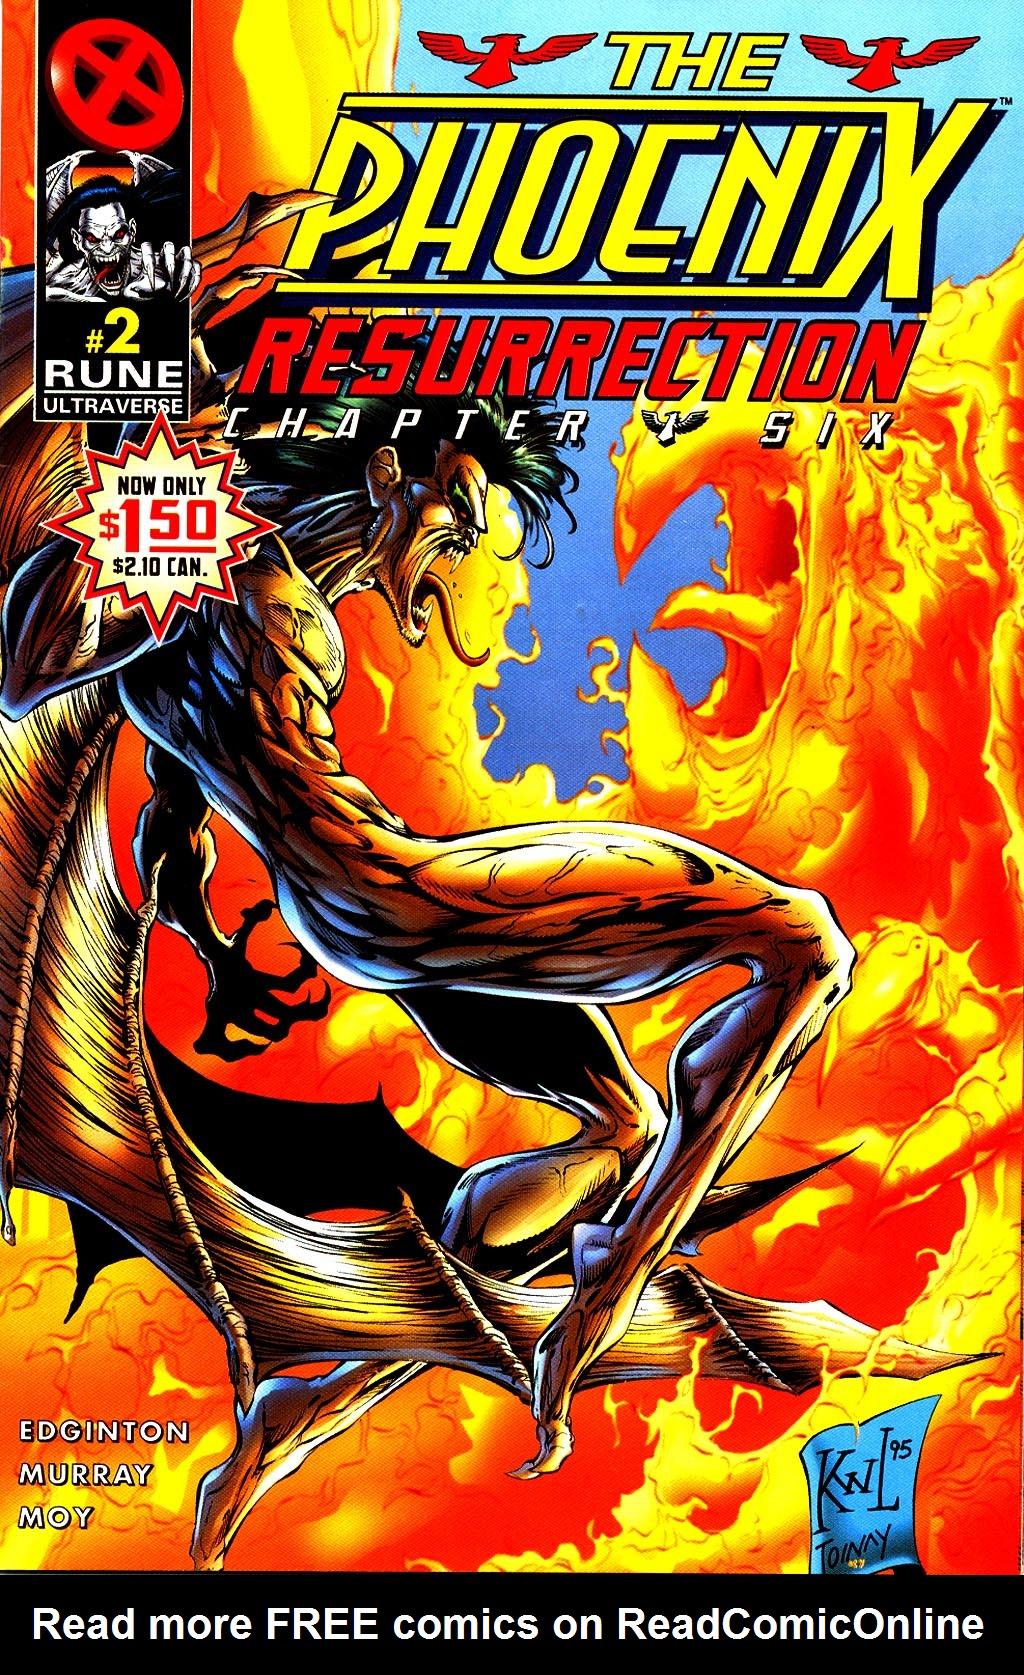 Read online Rune (1995) comic -  Issue #2 - 27